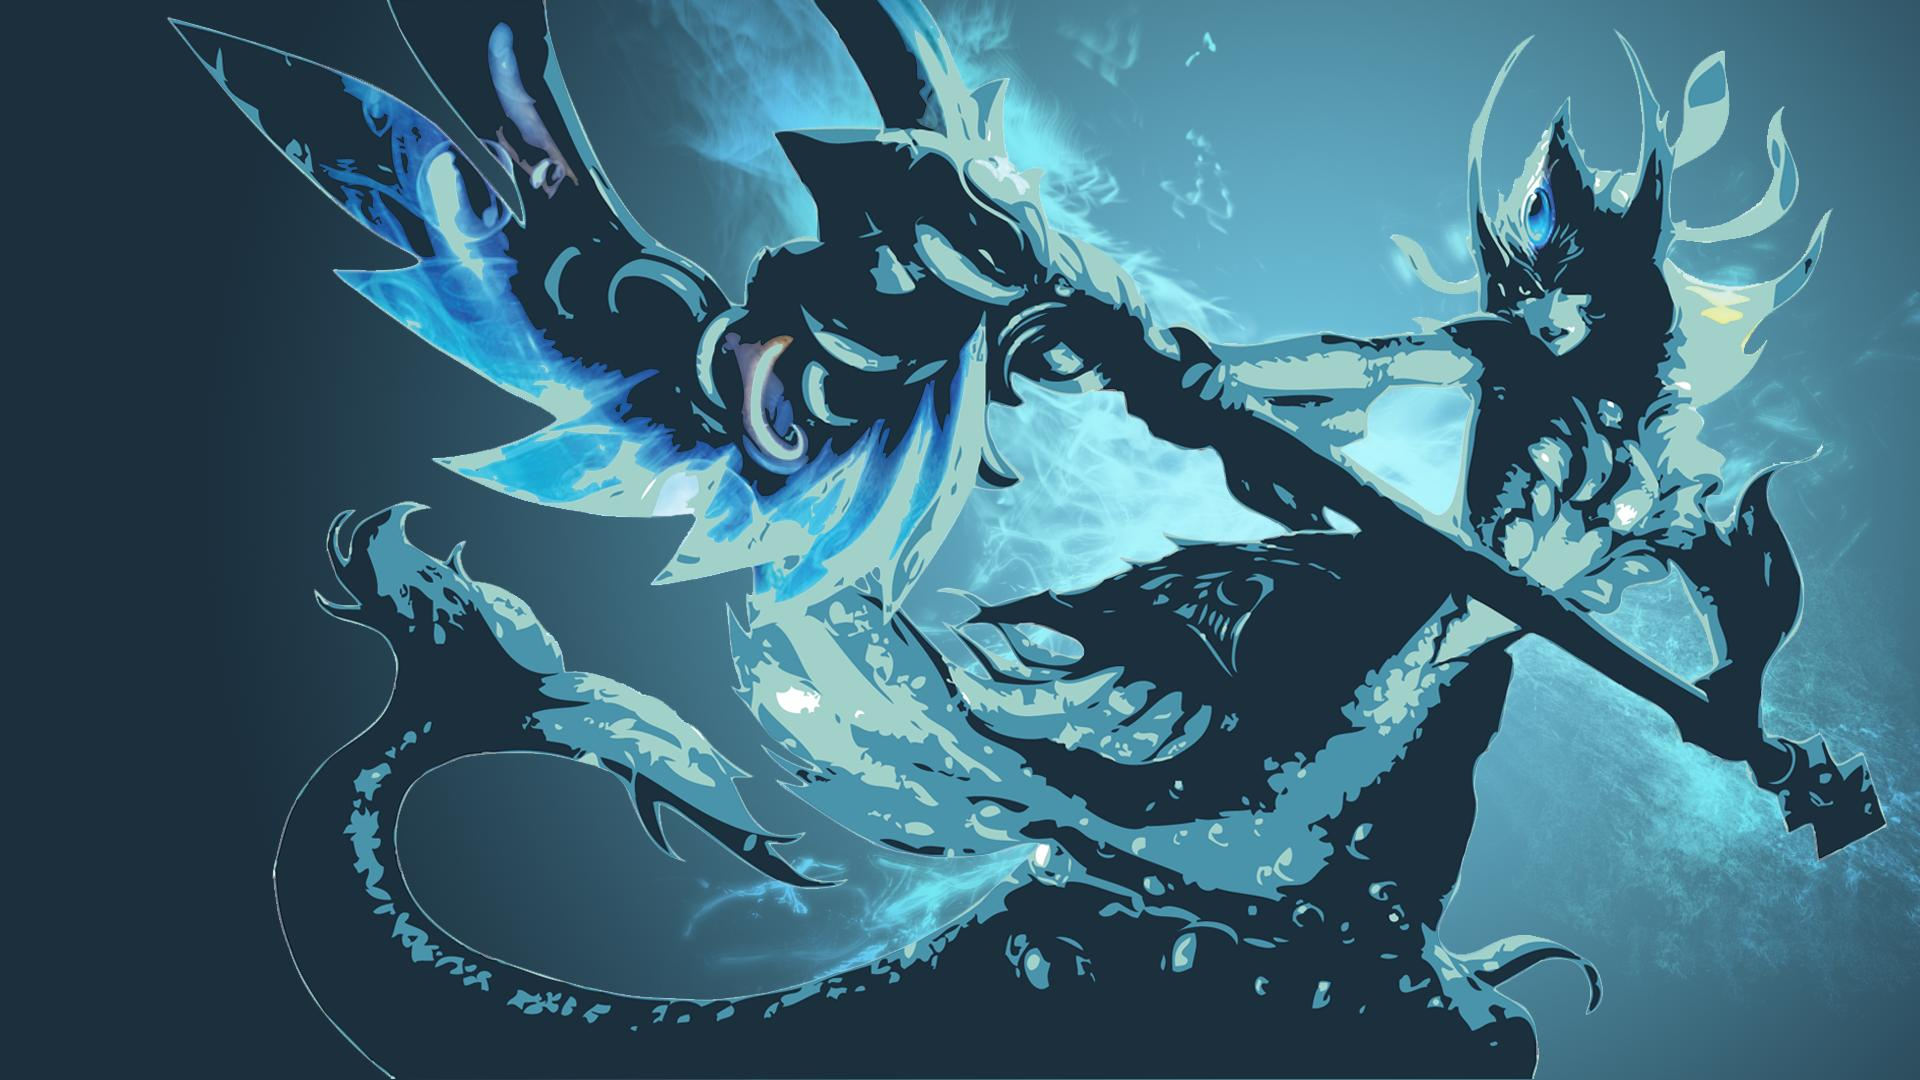 Lol Cute Riven Wallpaper Nami Classic Skin Minimalistic Fan Art League Of Legends